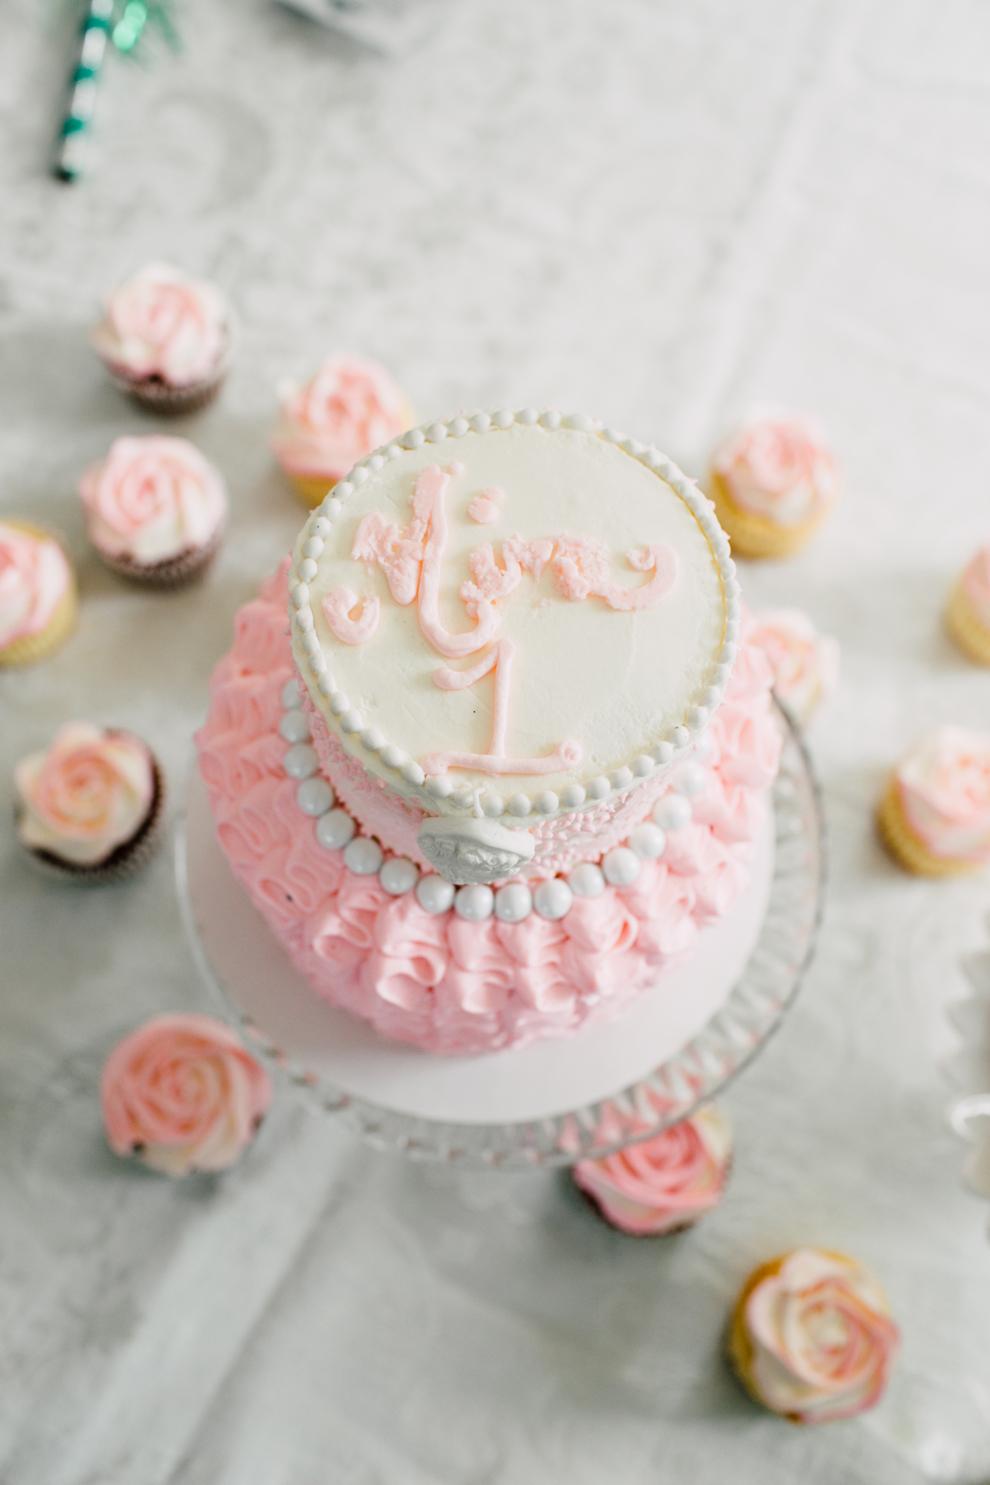 038-one-year-birthday-party-event-photography-lynden-bellingham-katheryn-moran-mira.jpg